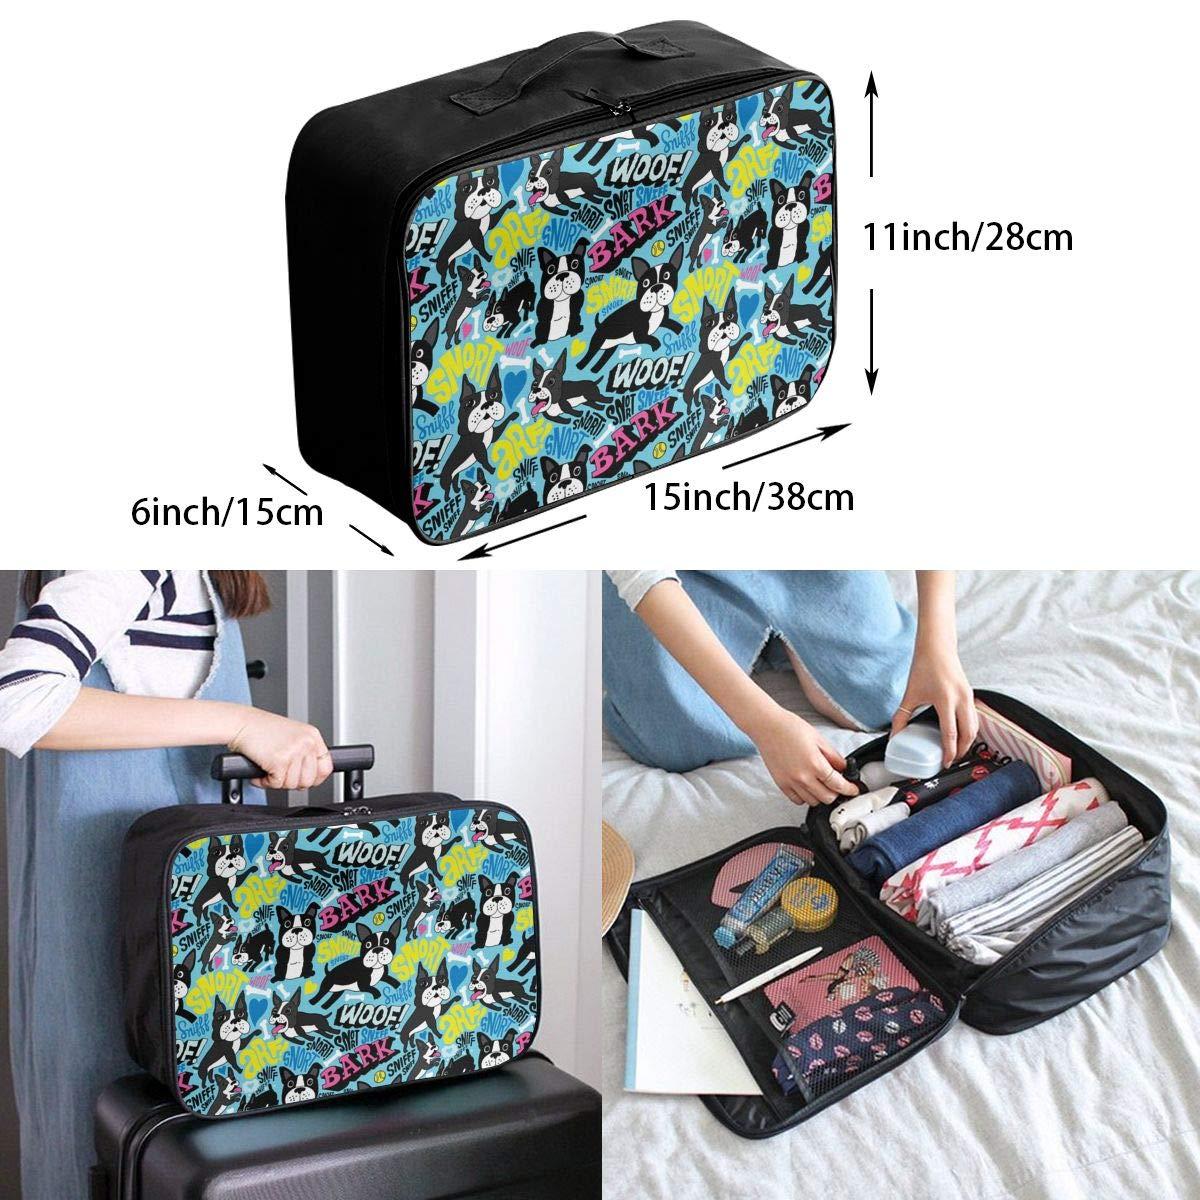 Lightweight Large Capacity Duffel Portable Luggage Bag Boston Terrier Pop Art Travel Waterproof Foldable Storage Carry Tote Bag